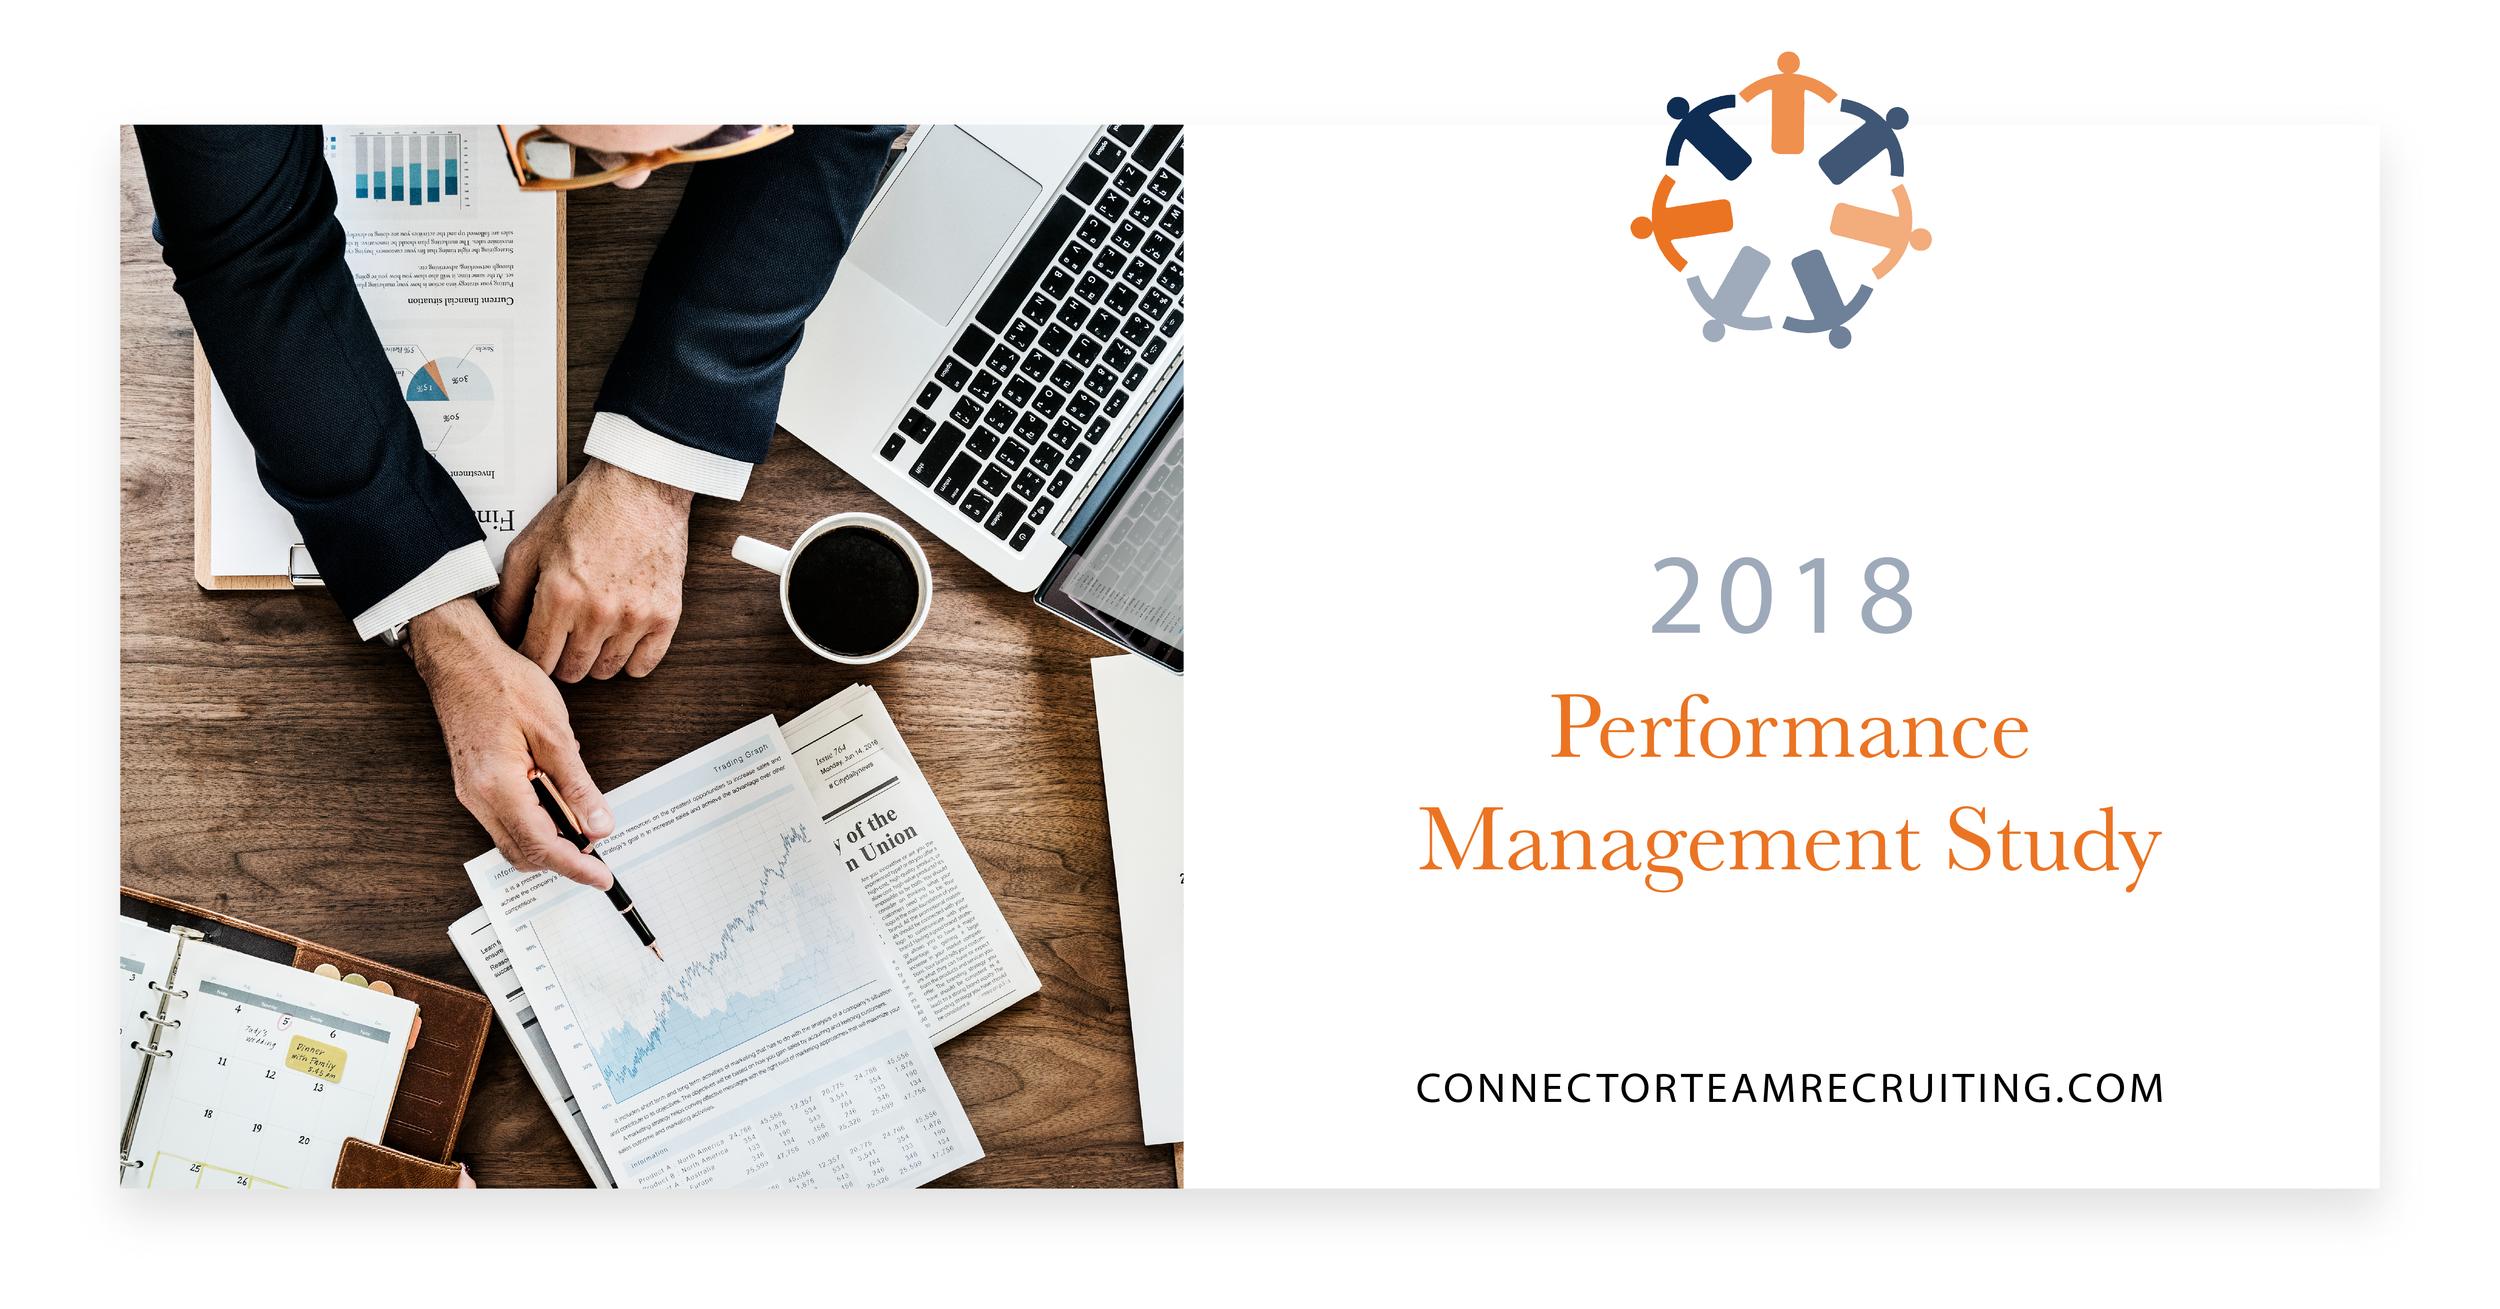 CTR_2018PerformanceManagementStudy.png